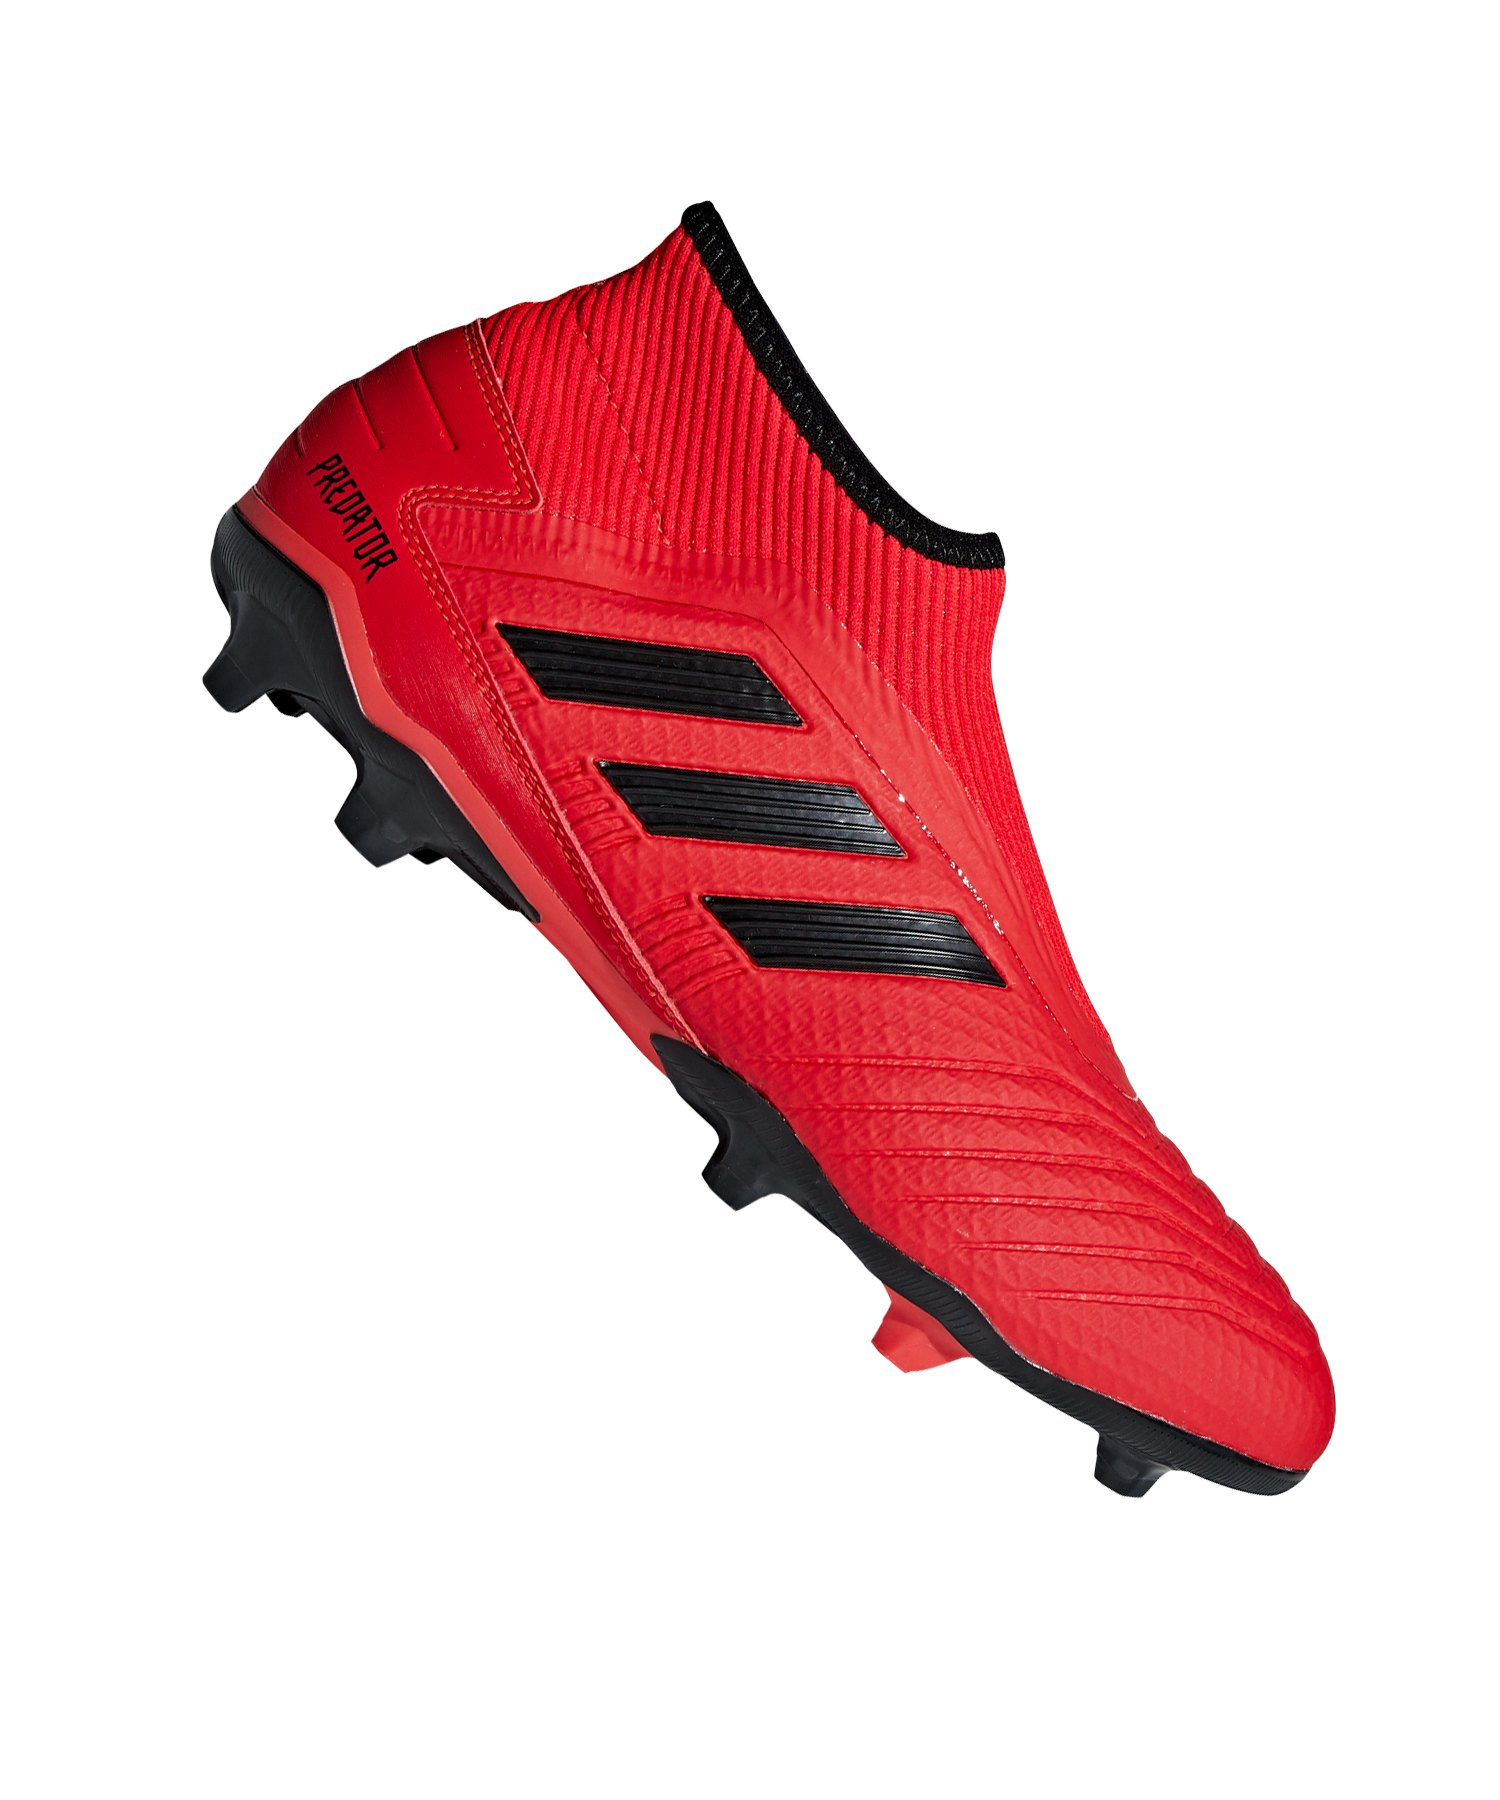 adidas Predator 19.3 LL FG Rot Schwarz - rot